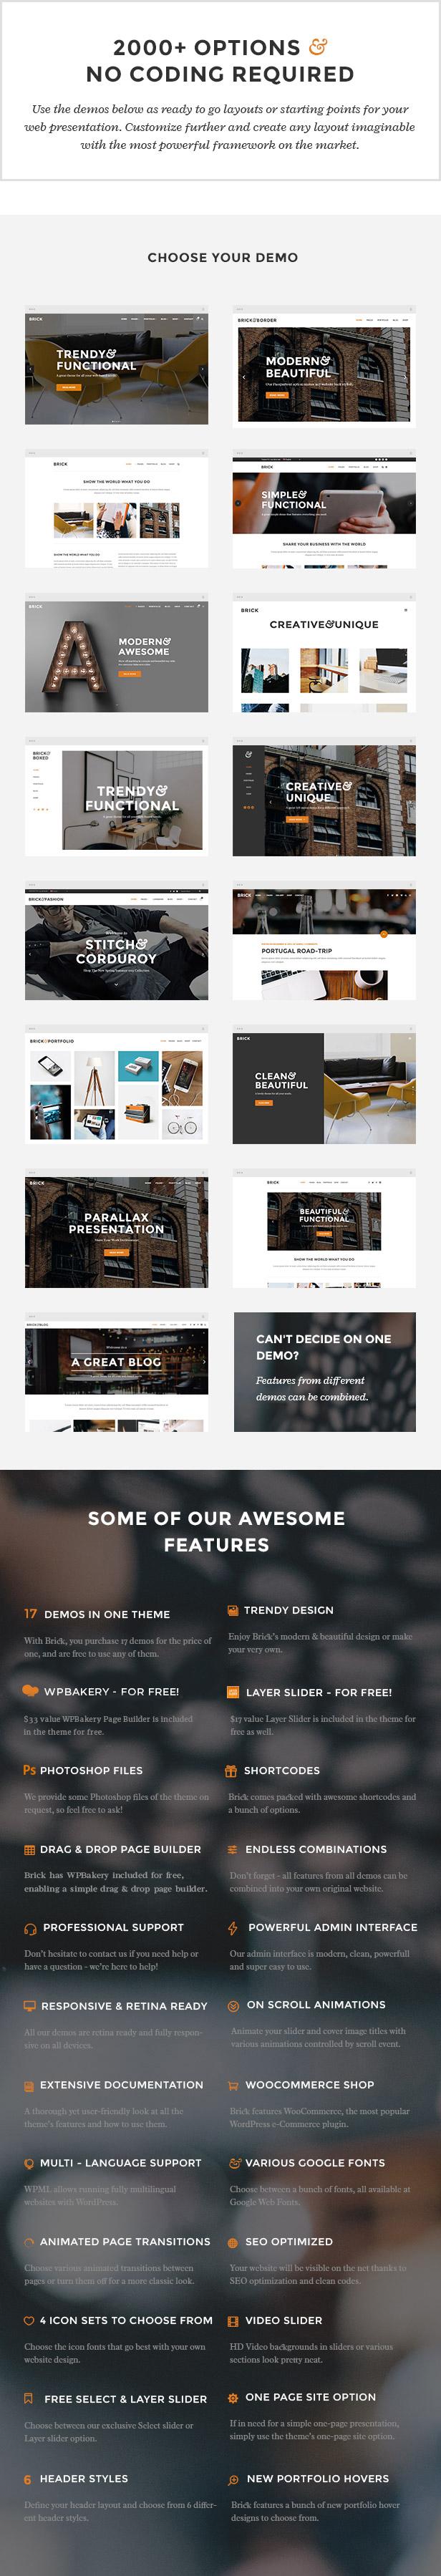 Brick - Digital Agency Theme - 1